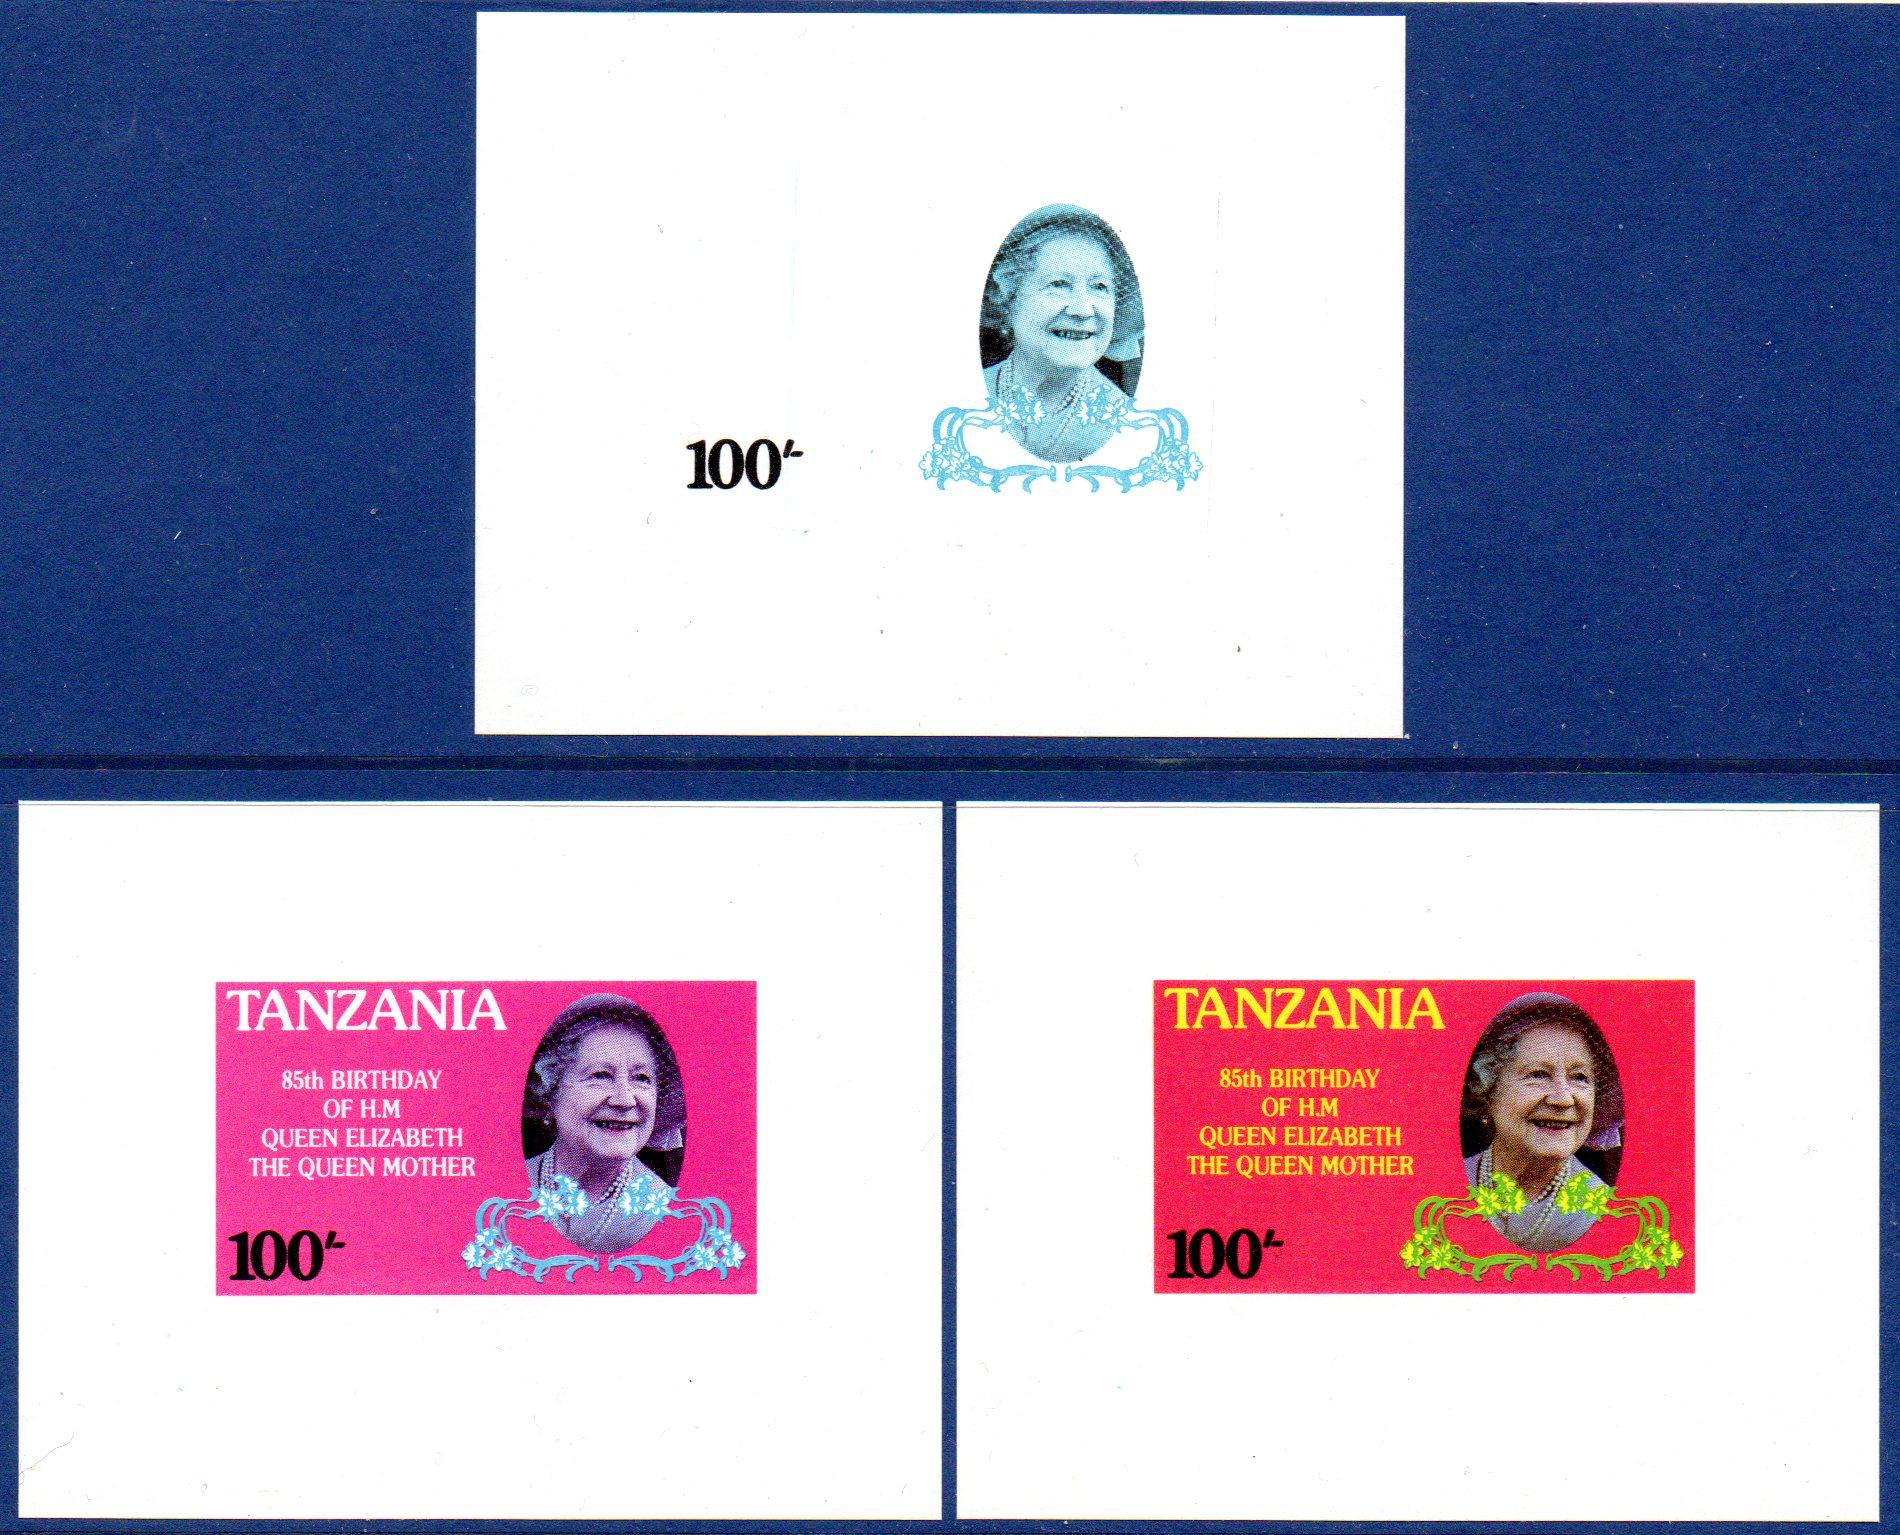 TANZANIA 1985 100s Progressive Proofs (3) Celebrating 85th Birthday Queen Mother